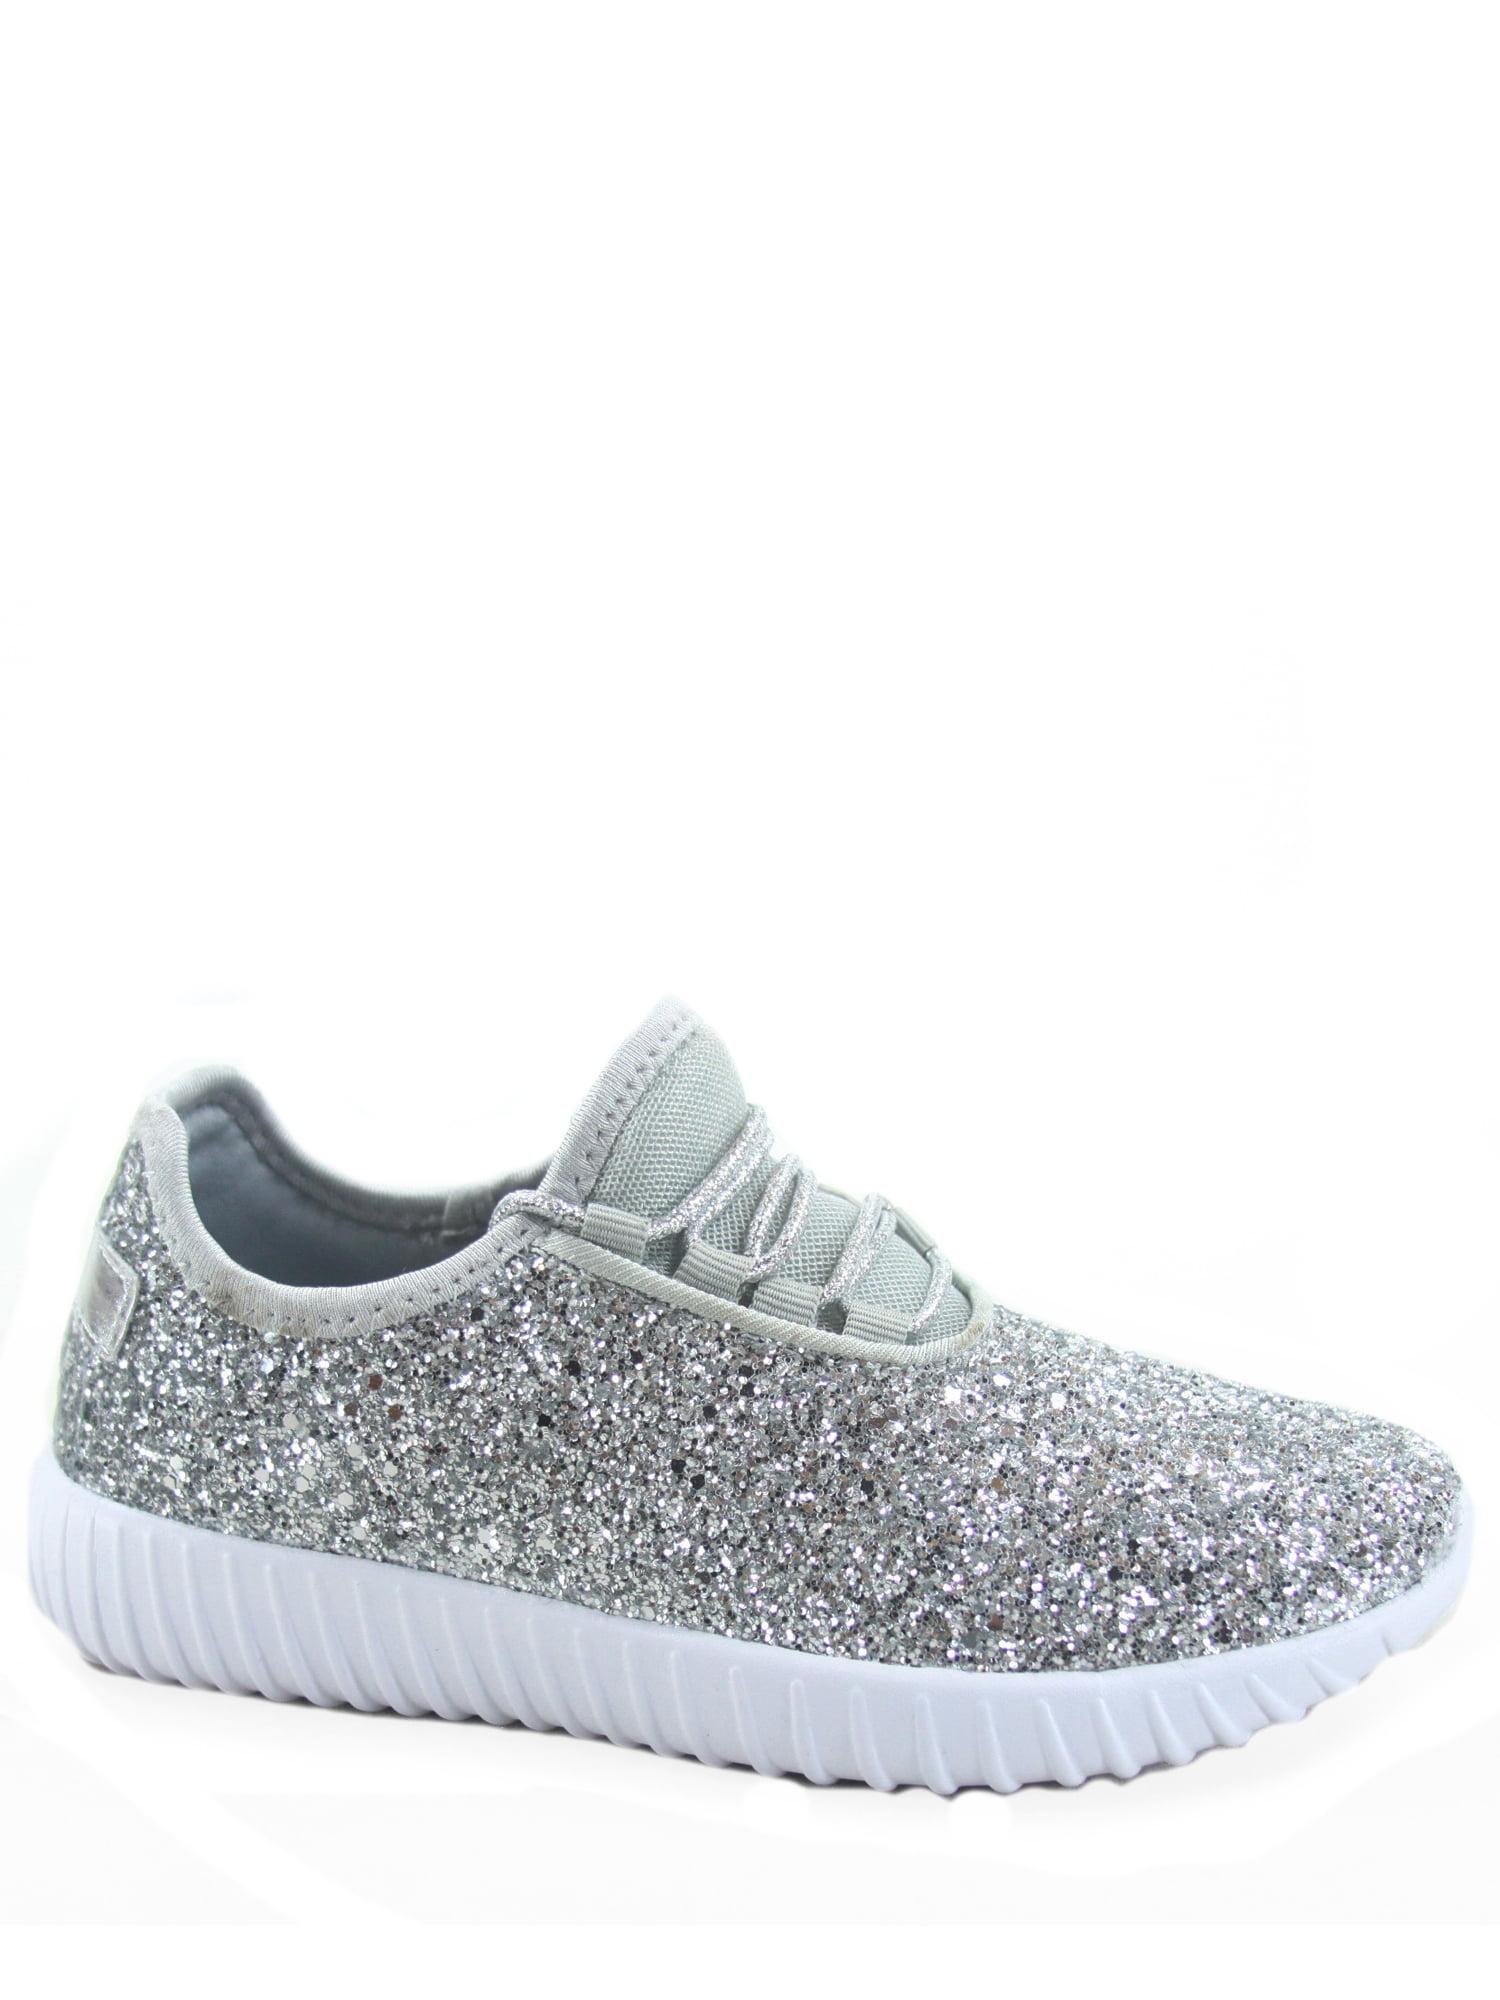 Silver Girls Shoes - Walmart.com